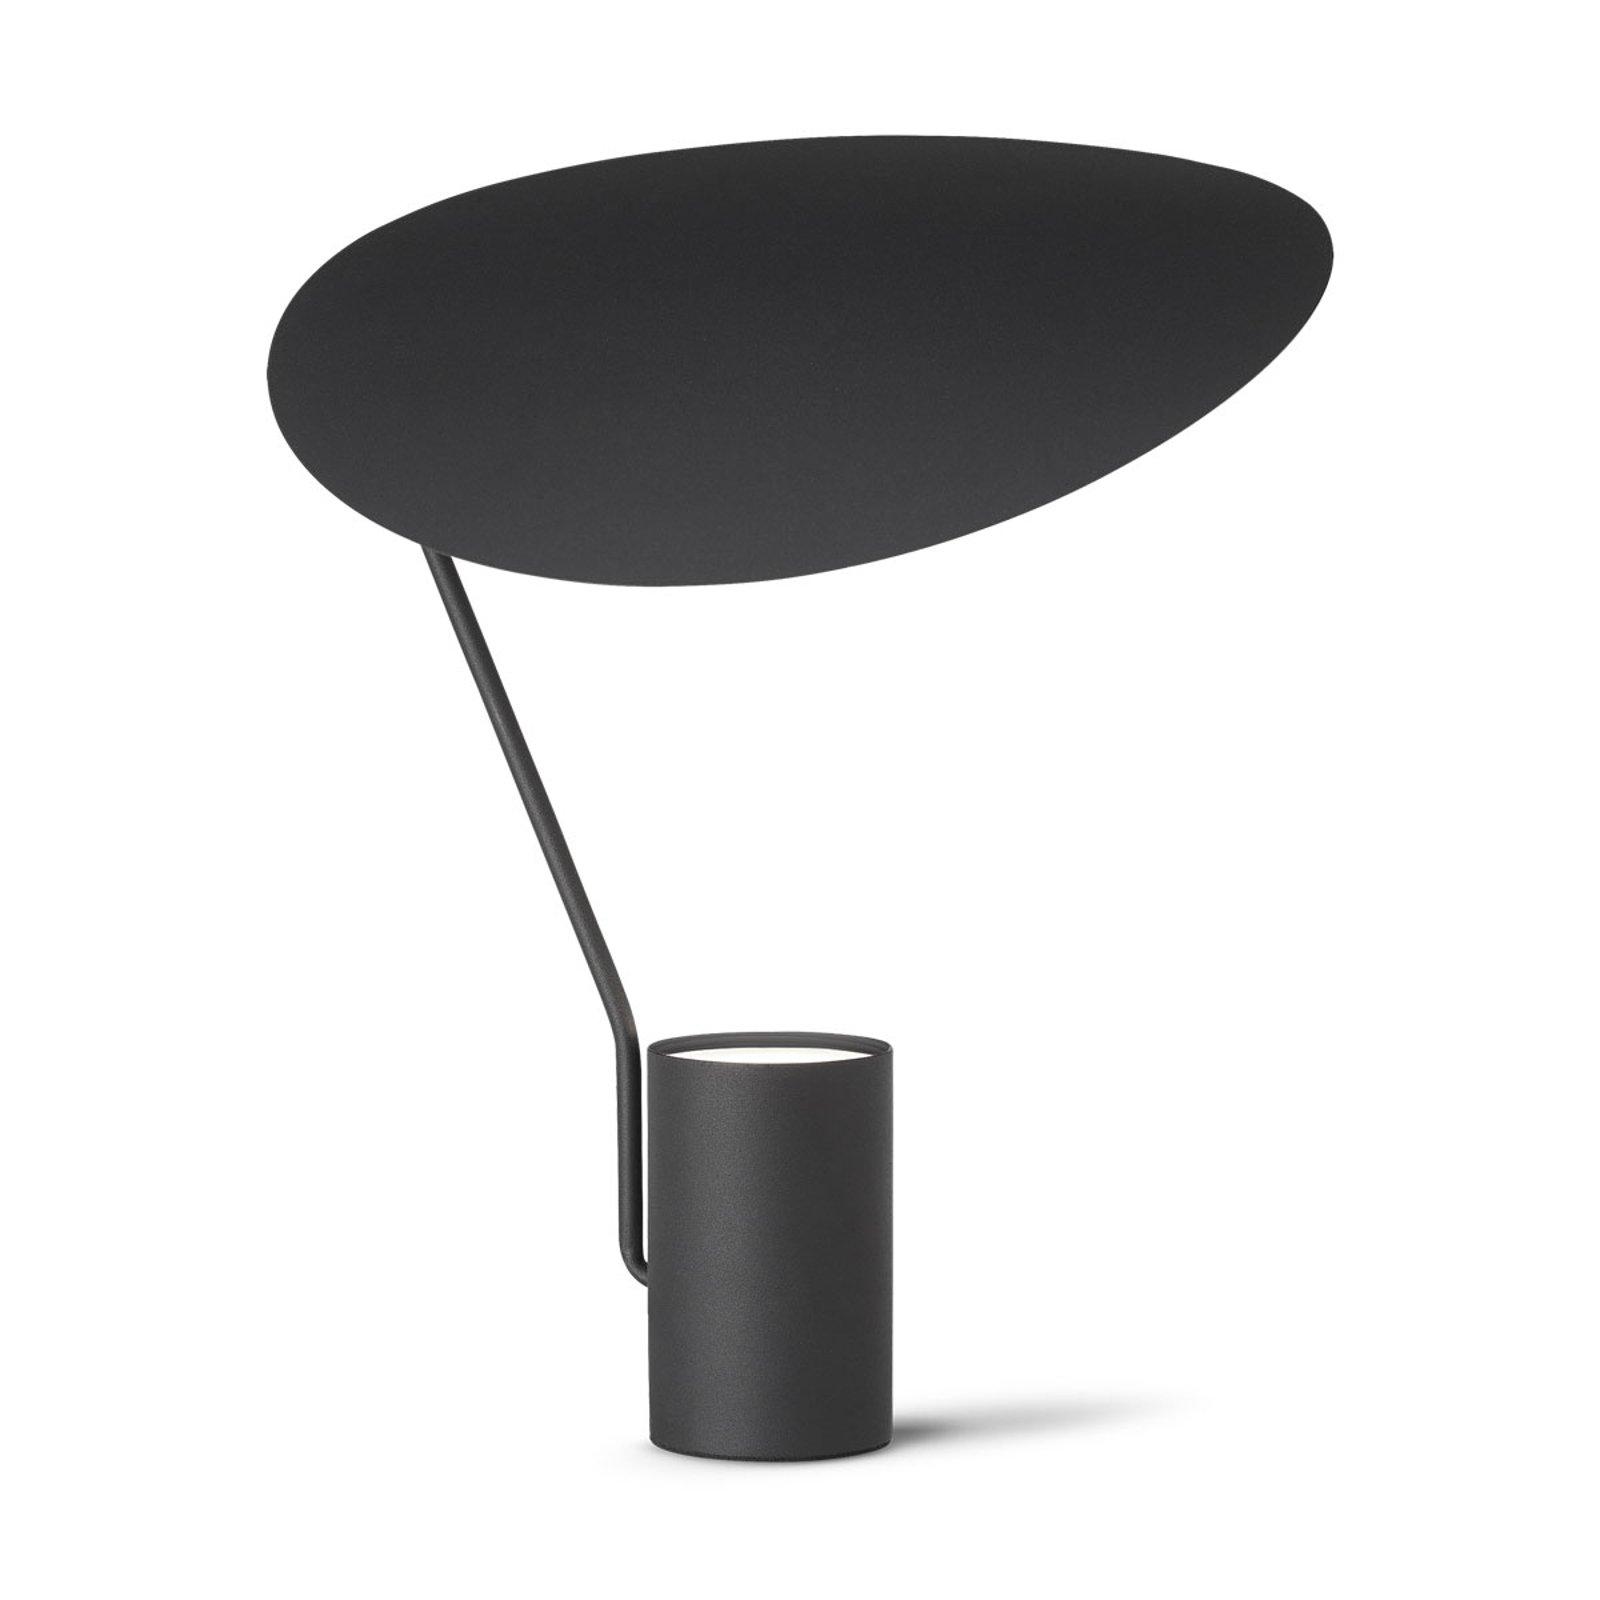 Northern Ombre bordlampe, svart